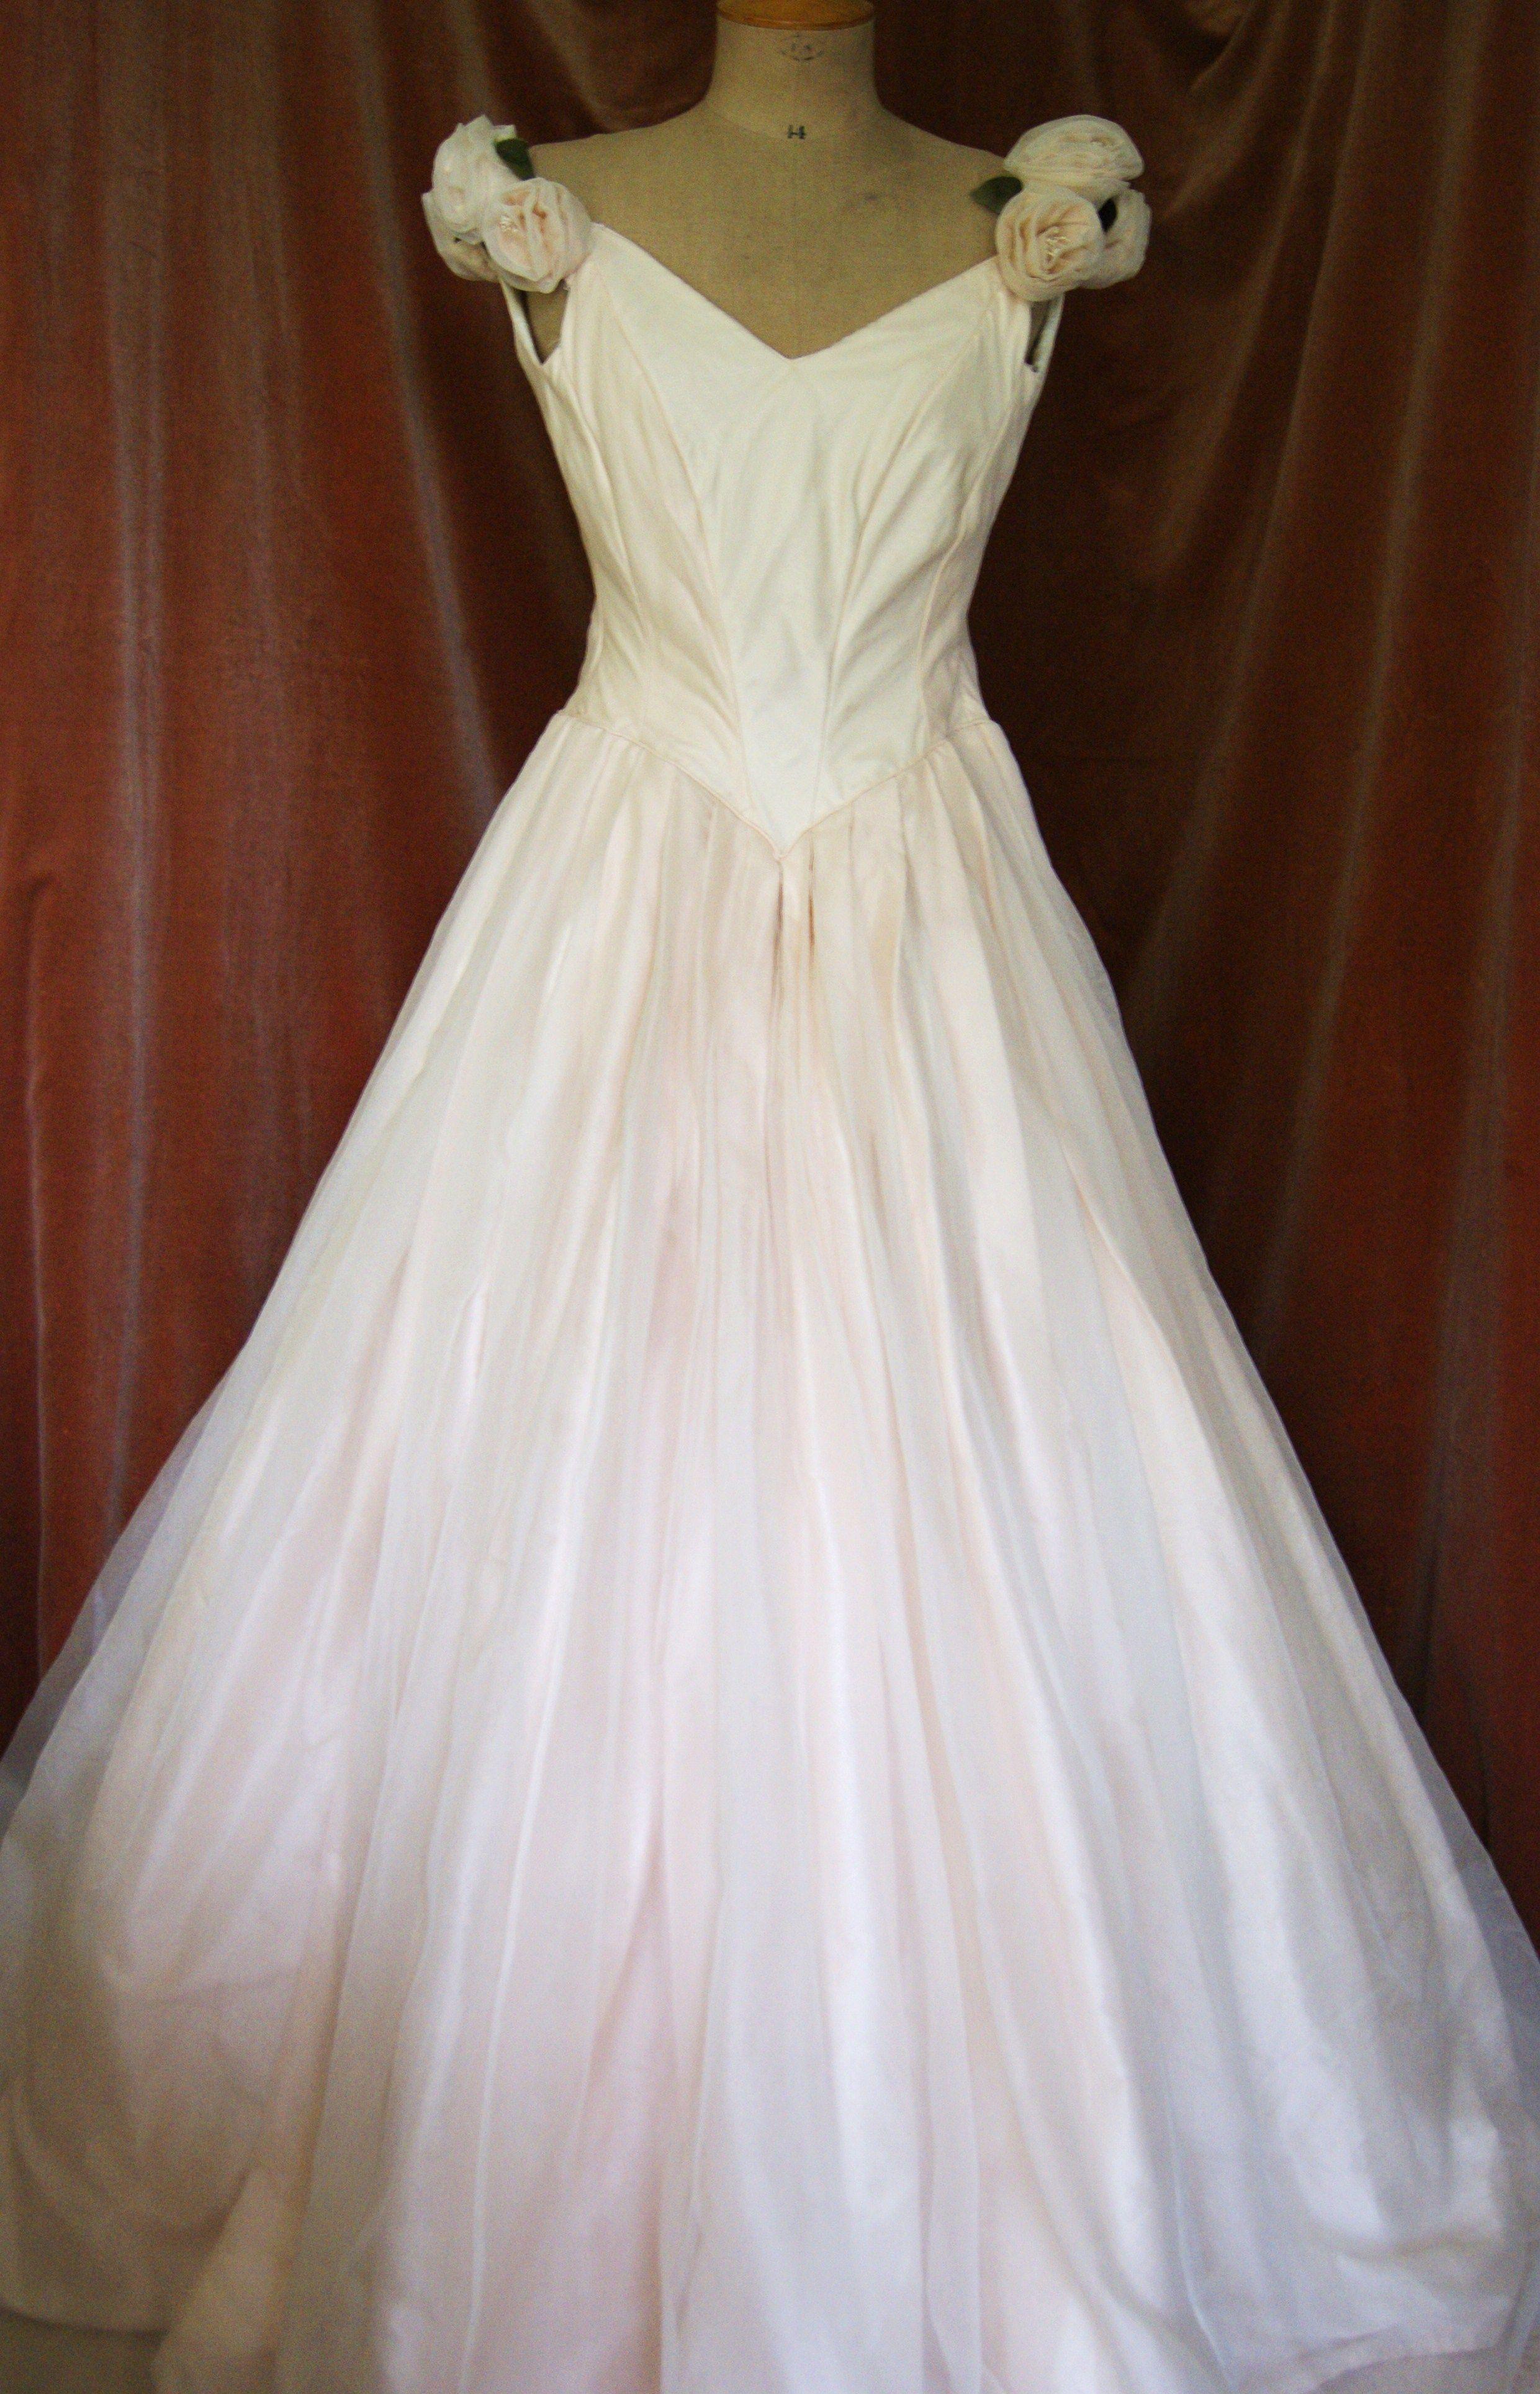 1940s Vintage Wedding Dresses 1940s wedding dress made